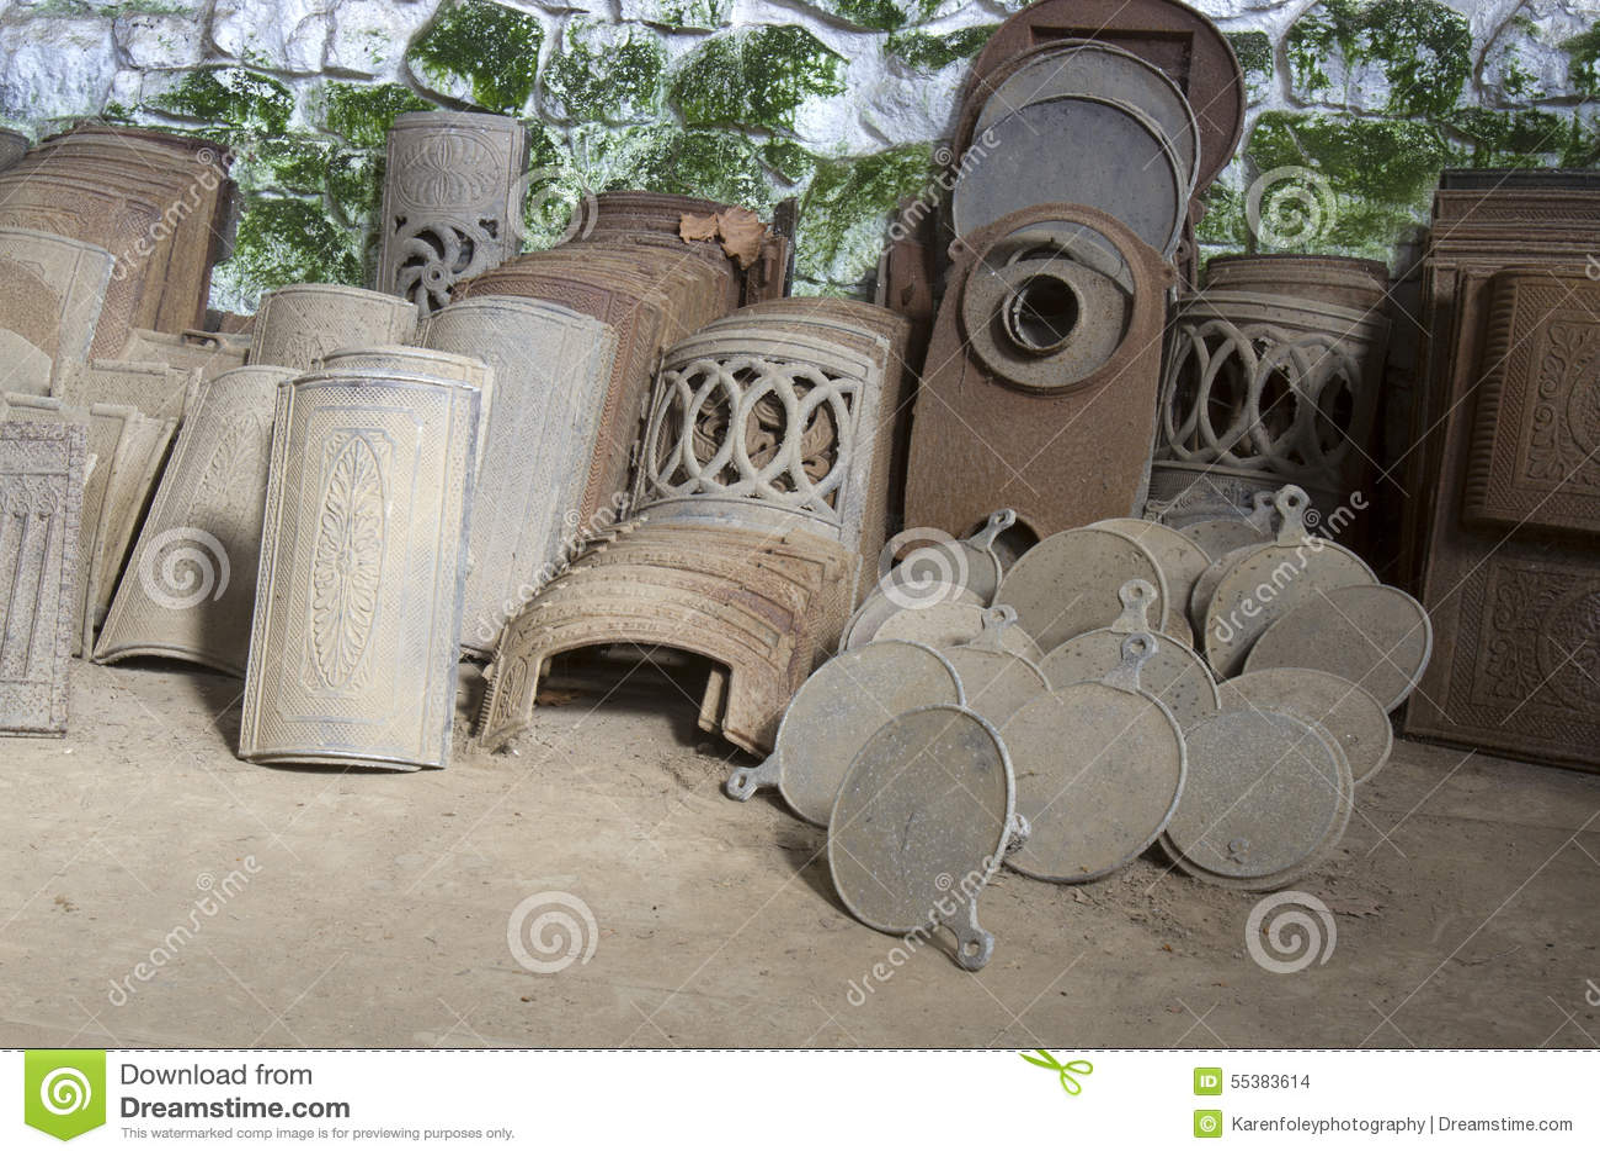 Antique Cast Iron Stove Parts Stock Photo Image 55383614